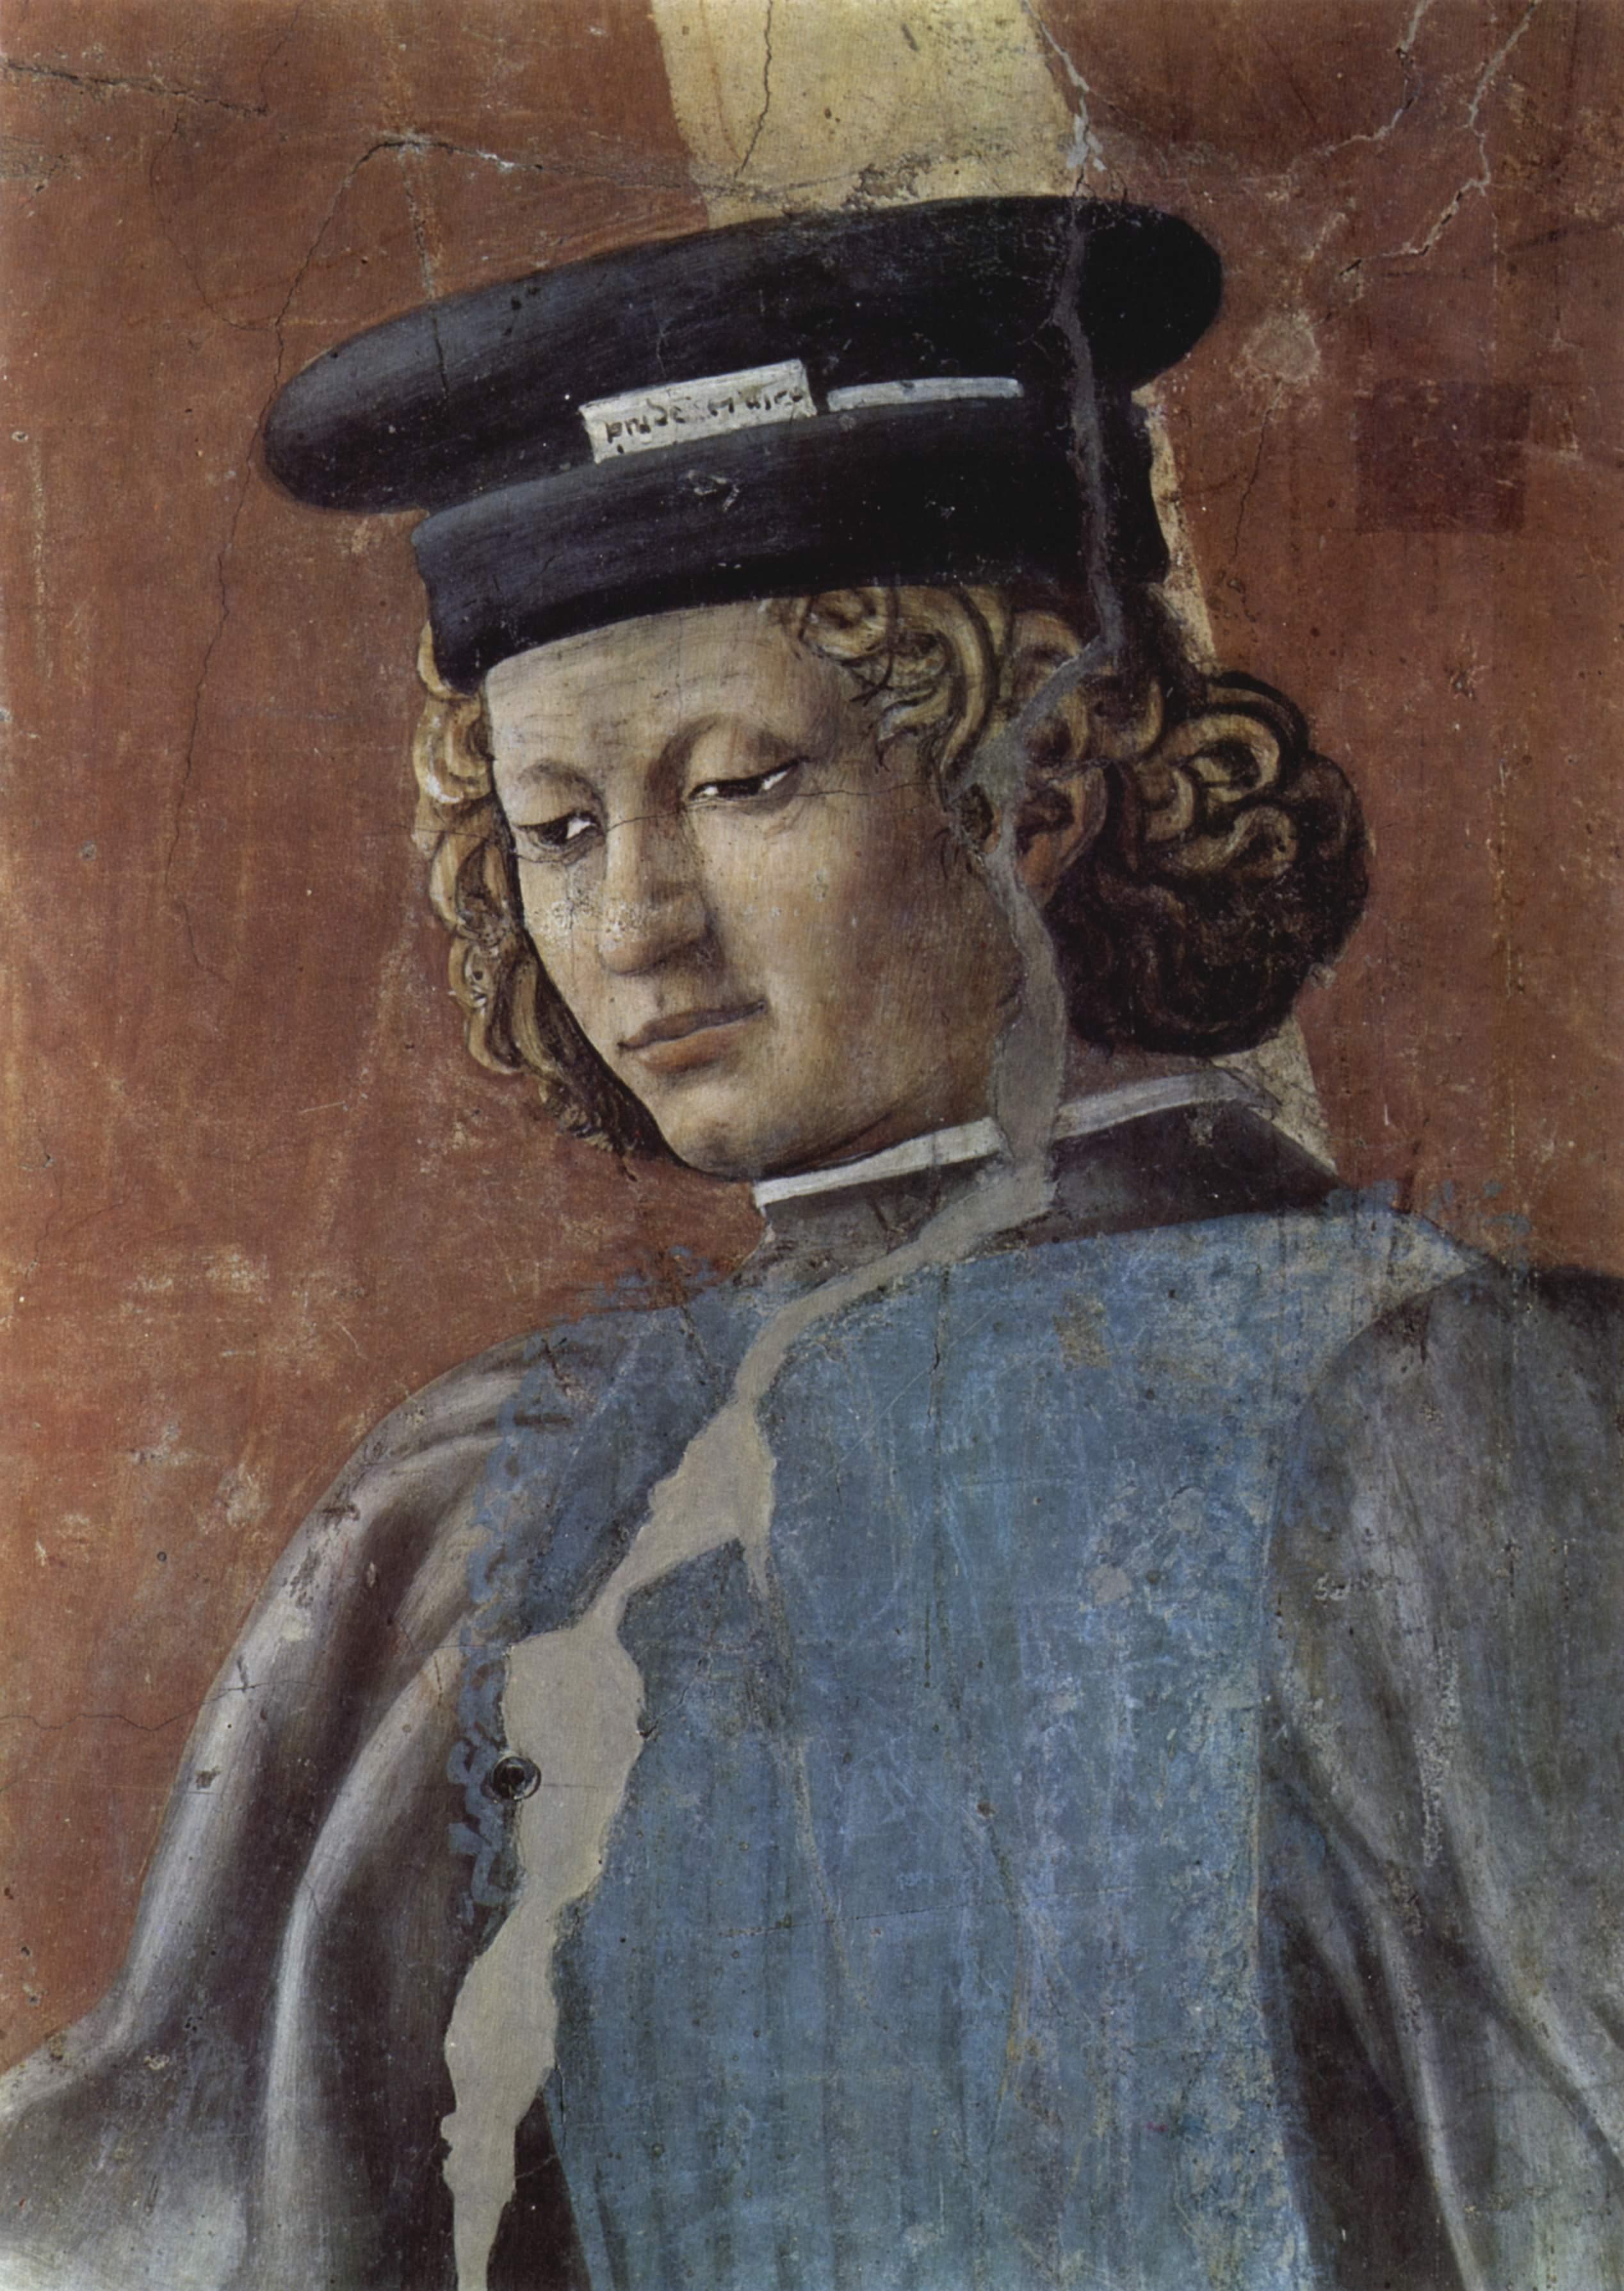 https://upload.wikimedia.org/wikipedia/commons/4/41/Piero_della_Francesca_001.jpg